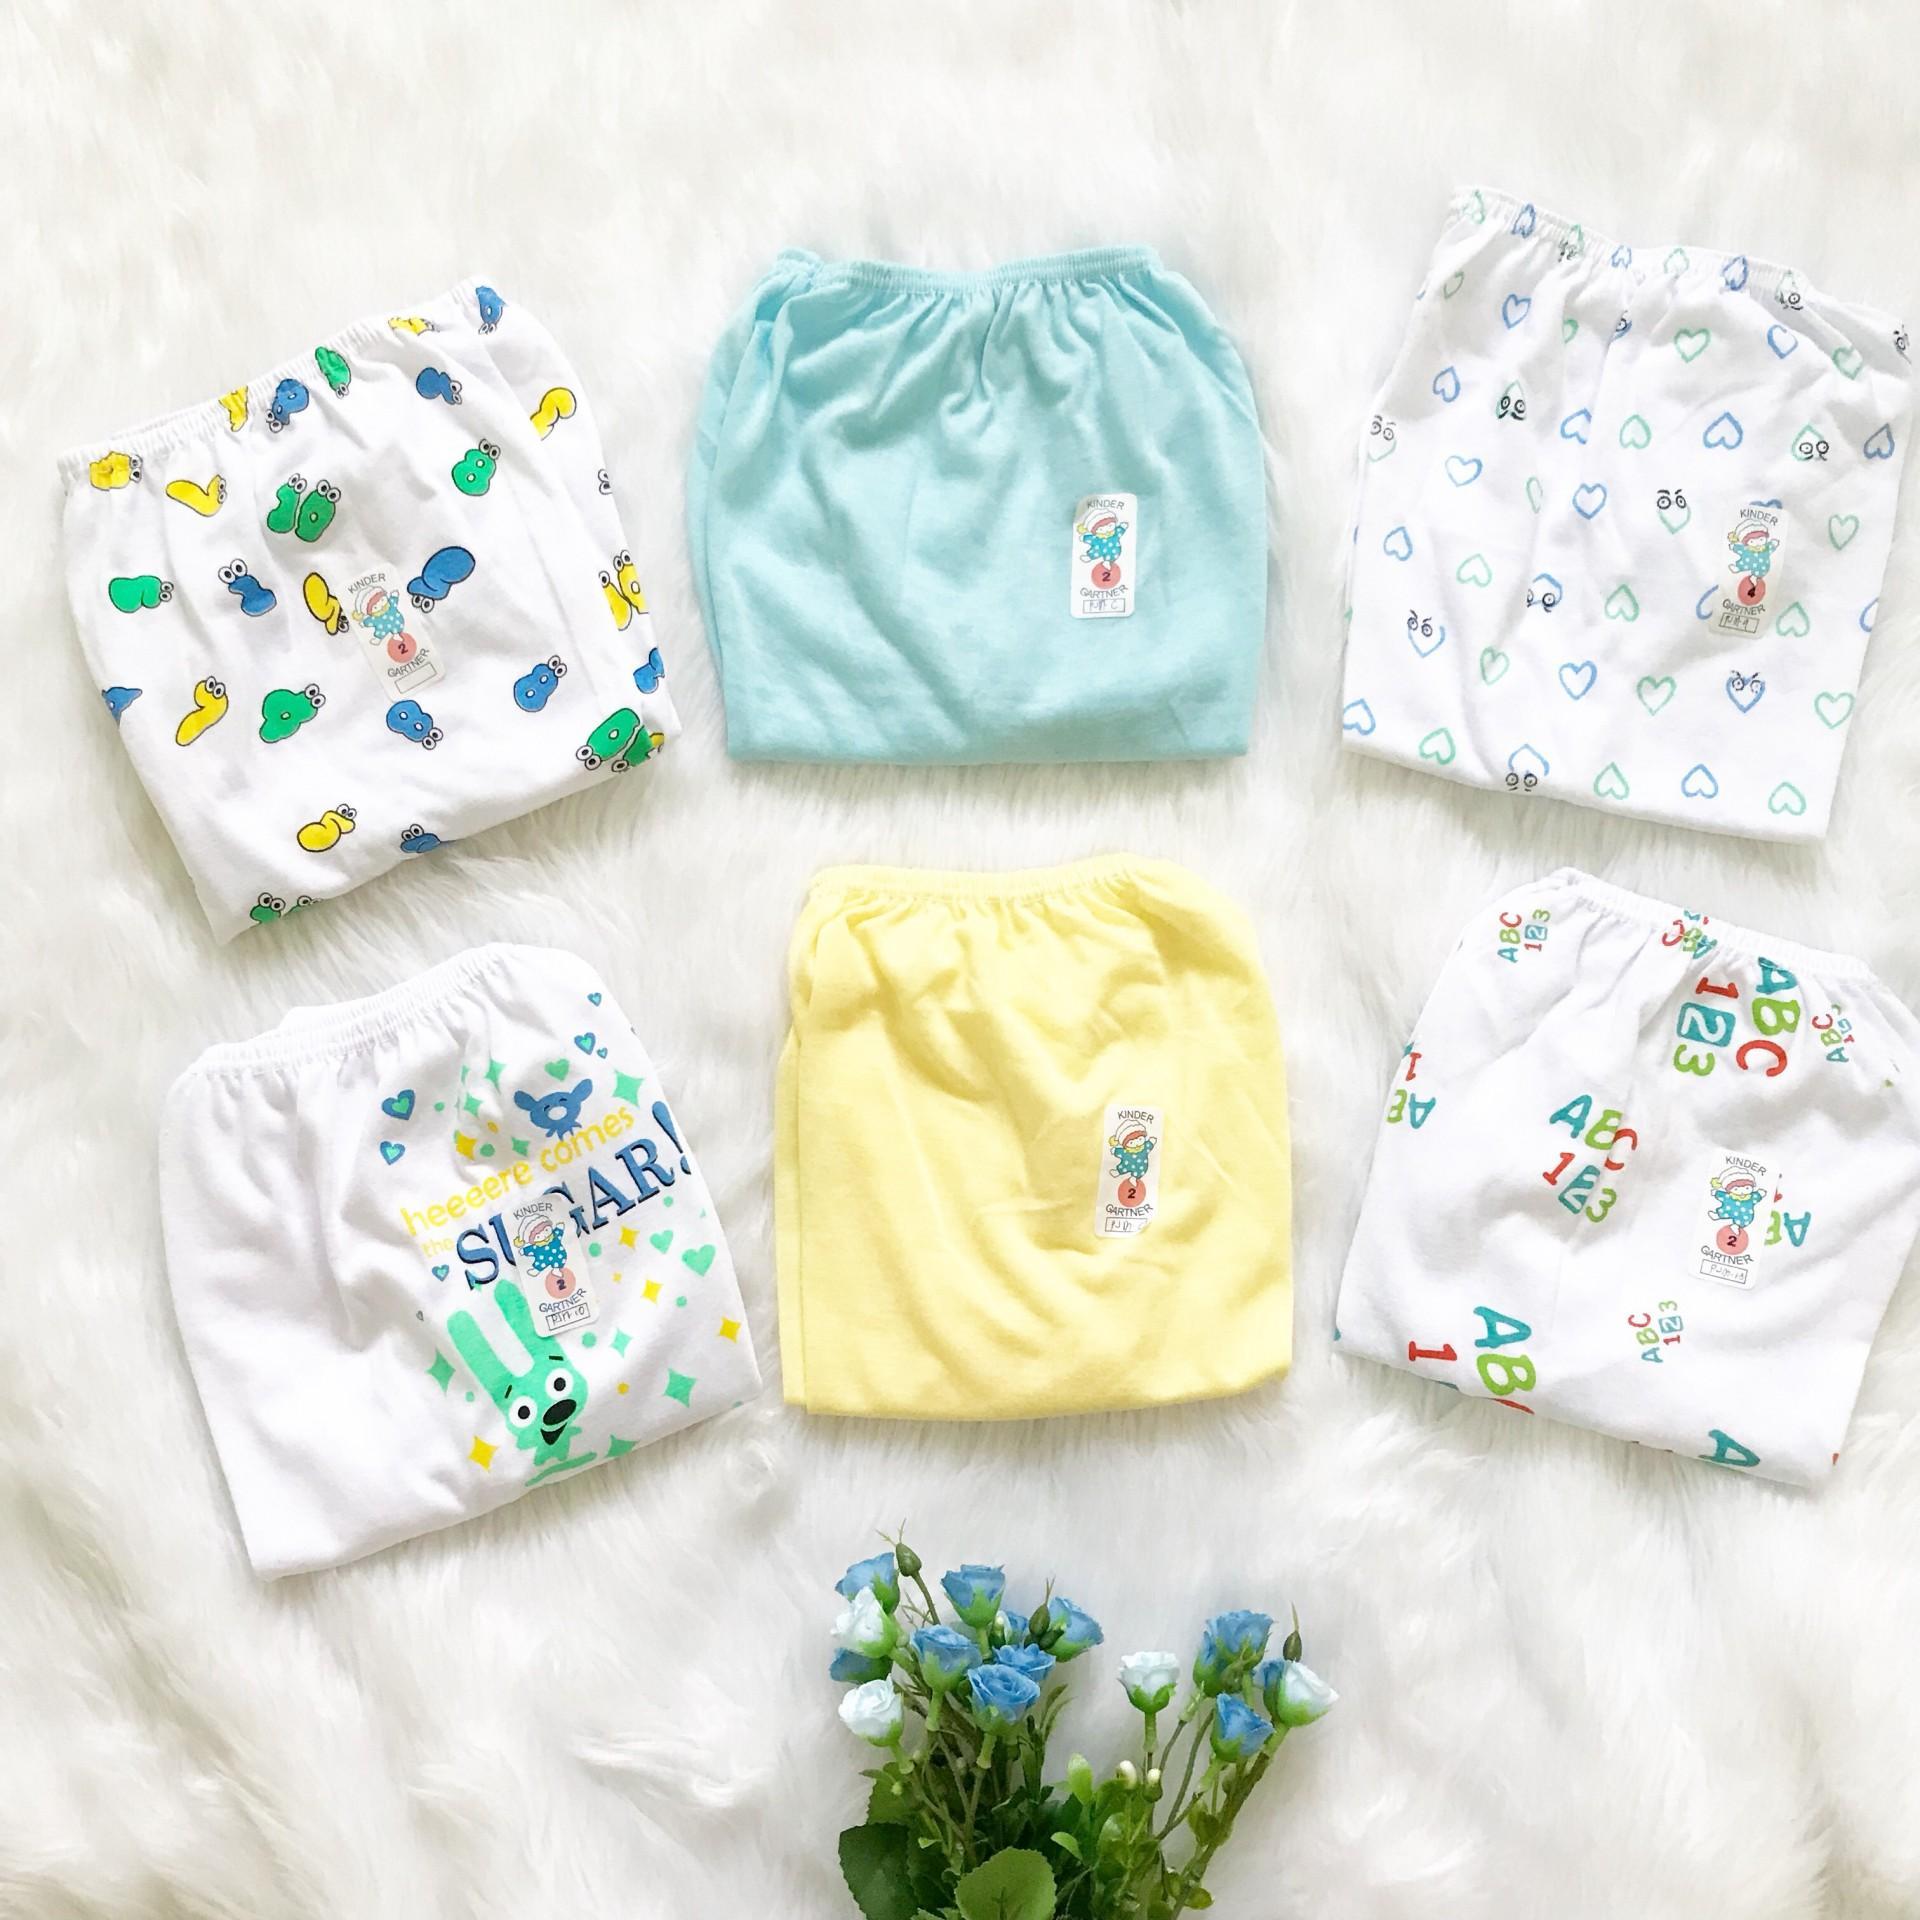 Newborn Clothes for sale - Newborn Baby Clothes online brands ... ecbf9f9f0e88